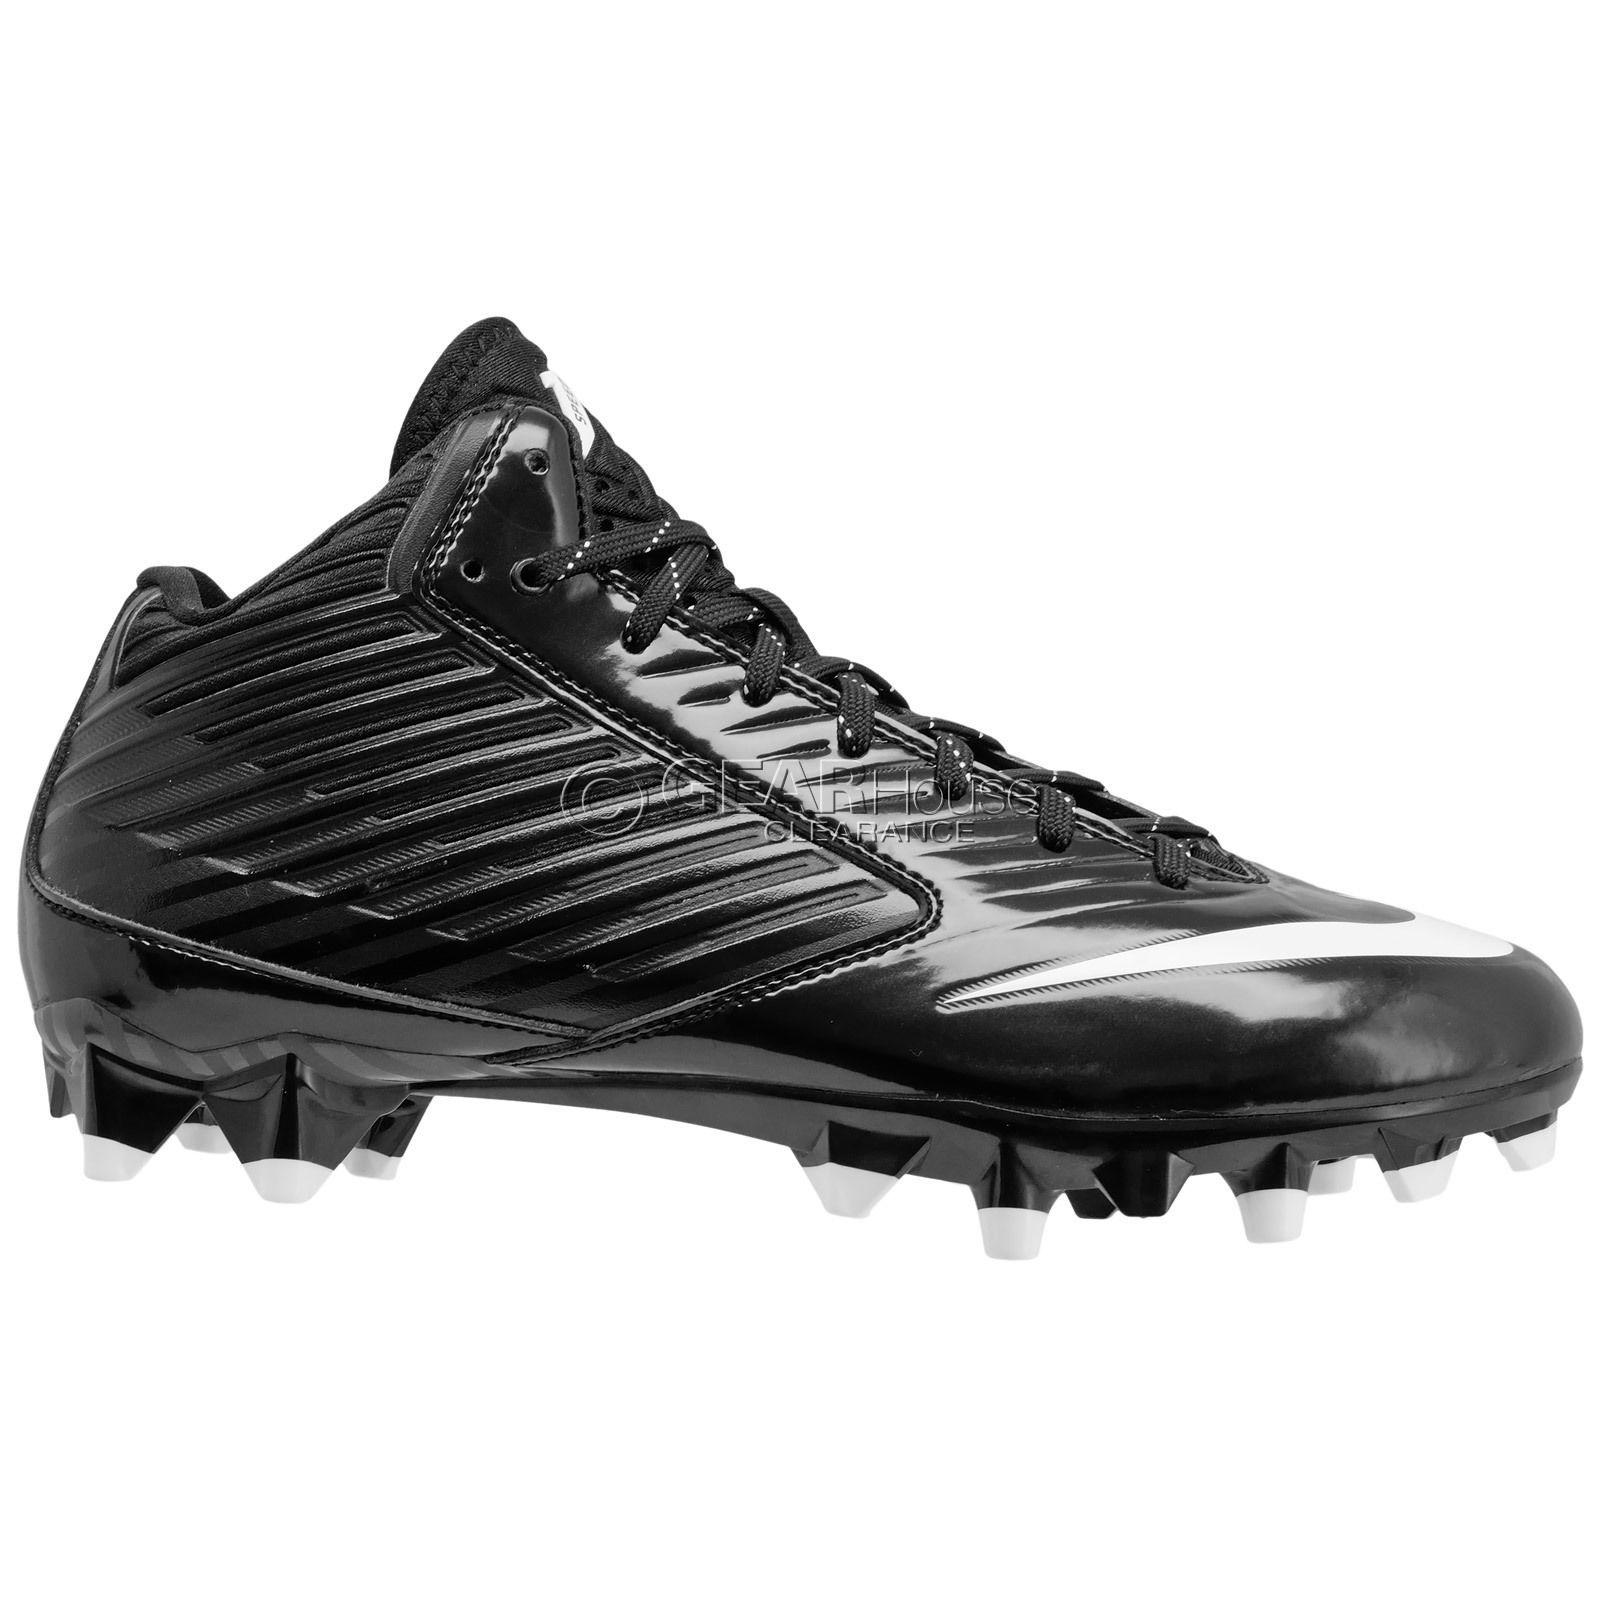 New Nike Vapor Speed 3/4 Mid TD Mens Football Cleats : Black